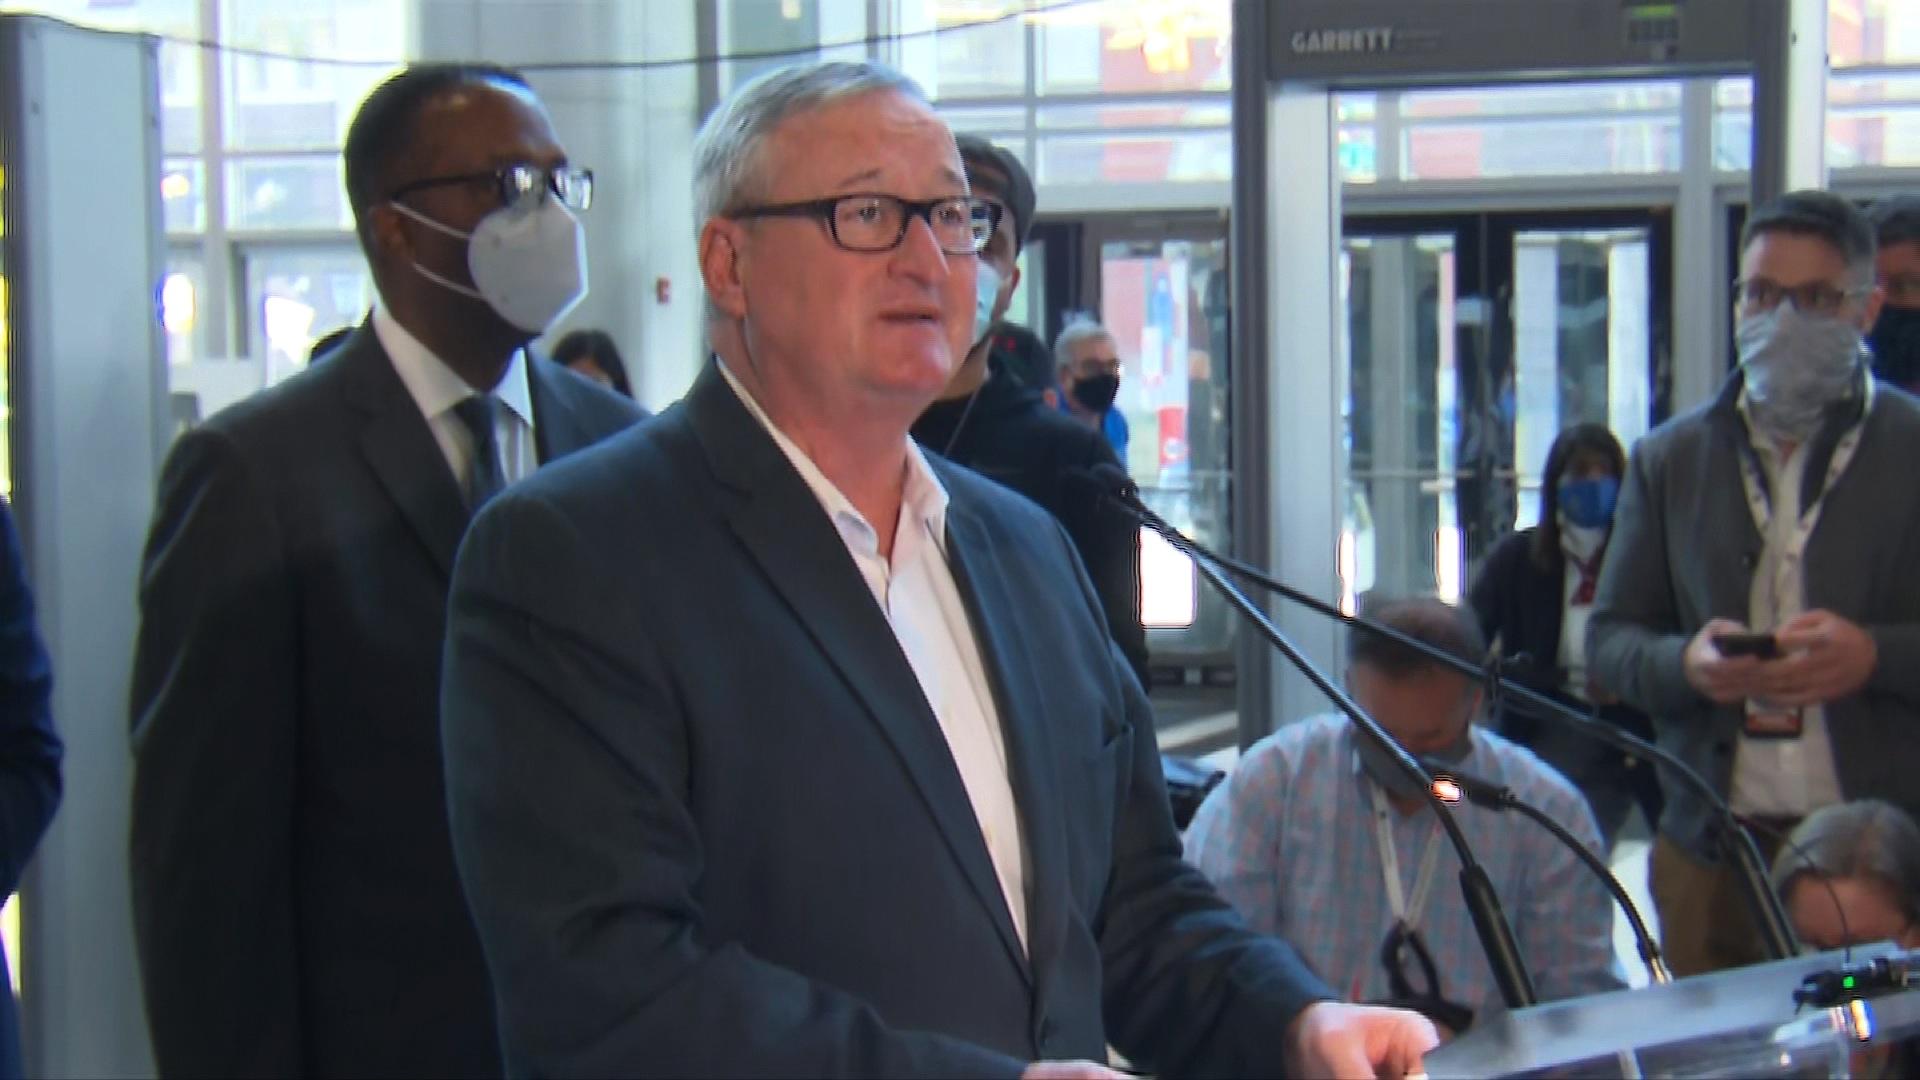 Philadelphia Mayor Jim Kenney speaks during a press conference in Philadelphia on November 6.